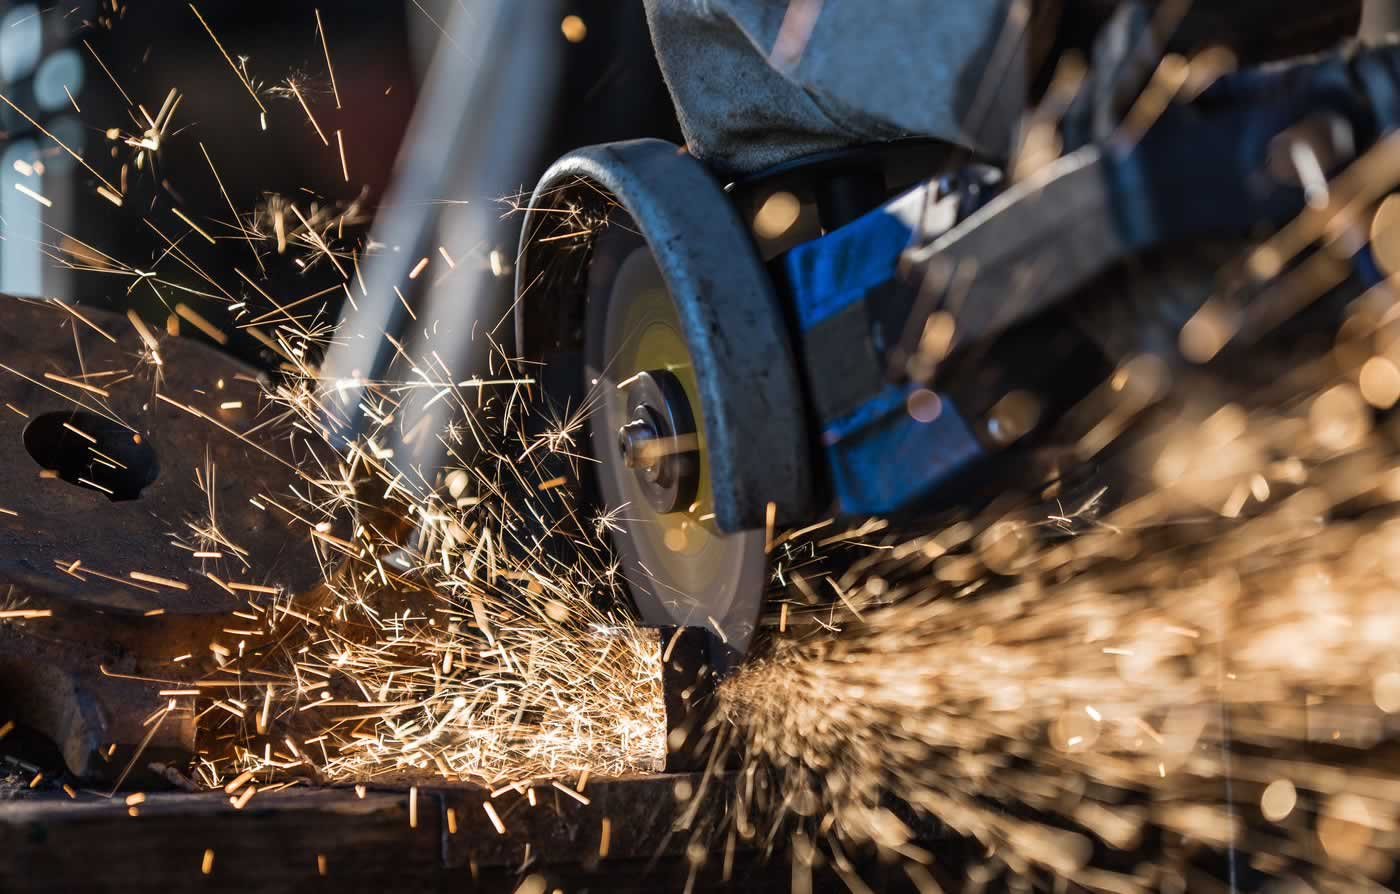 Close up metal cutting creating sparks